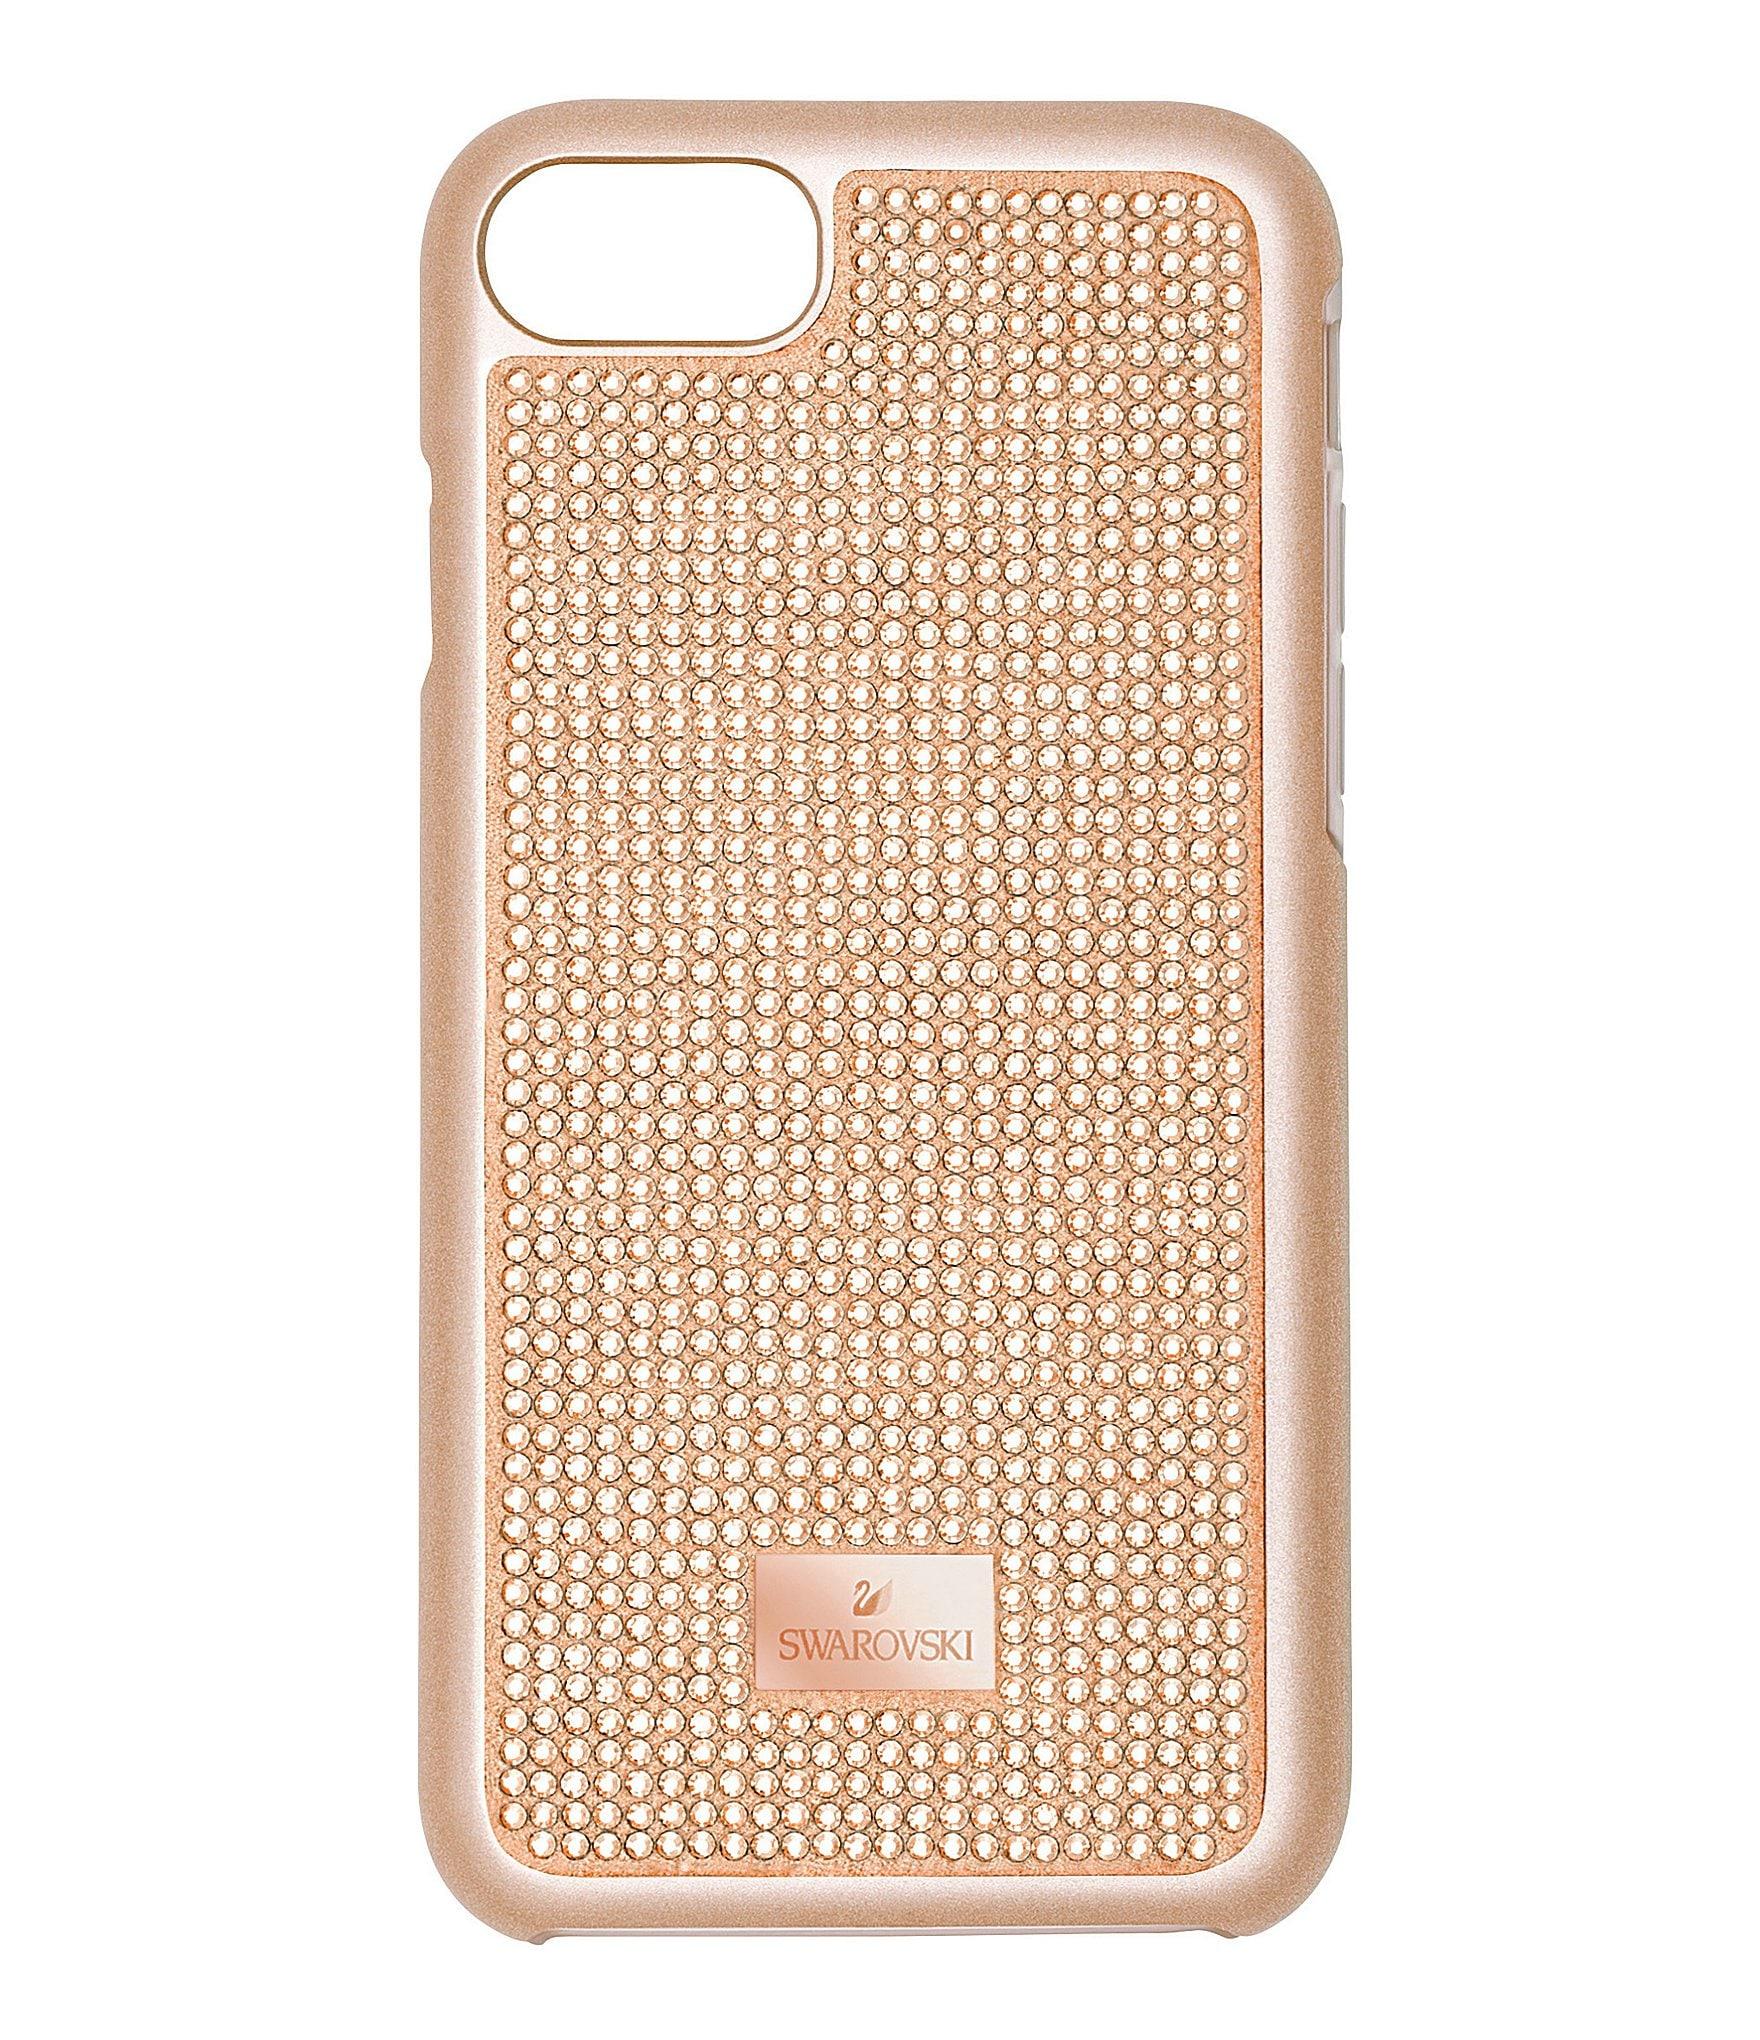 Swarovski Iphone  Case Rose Gold